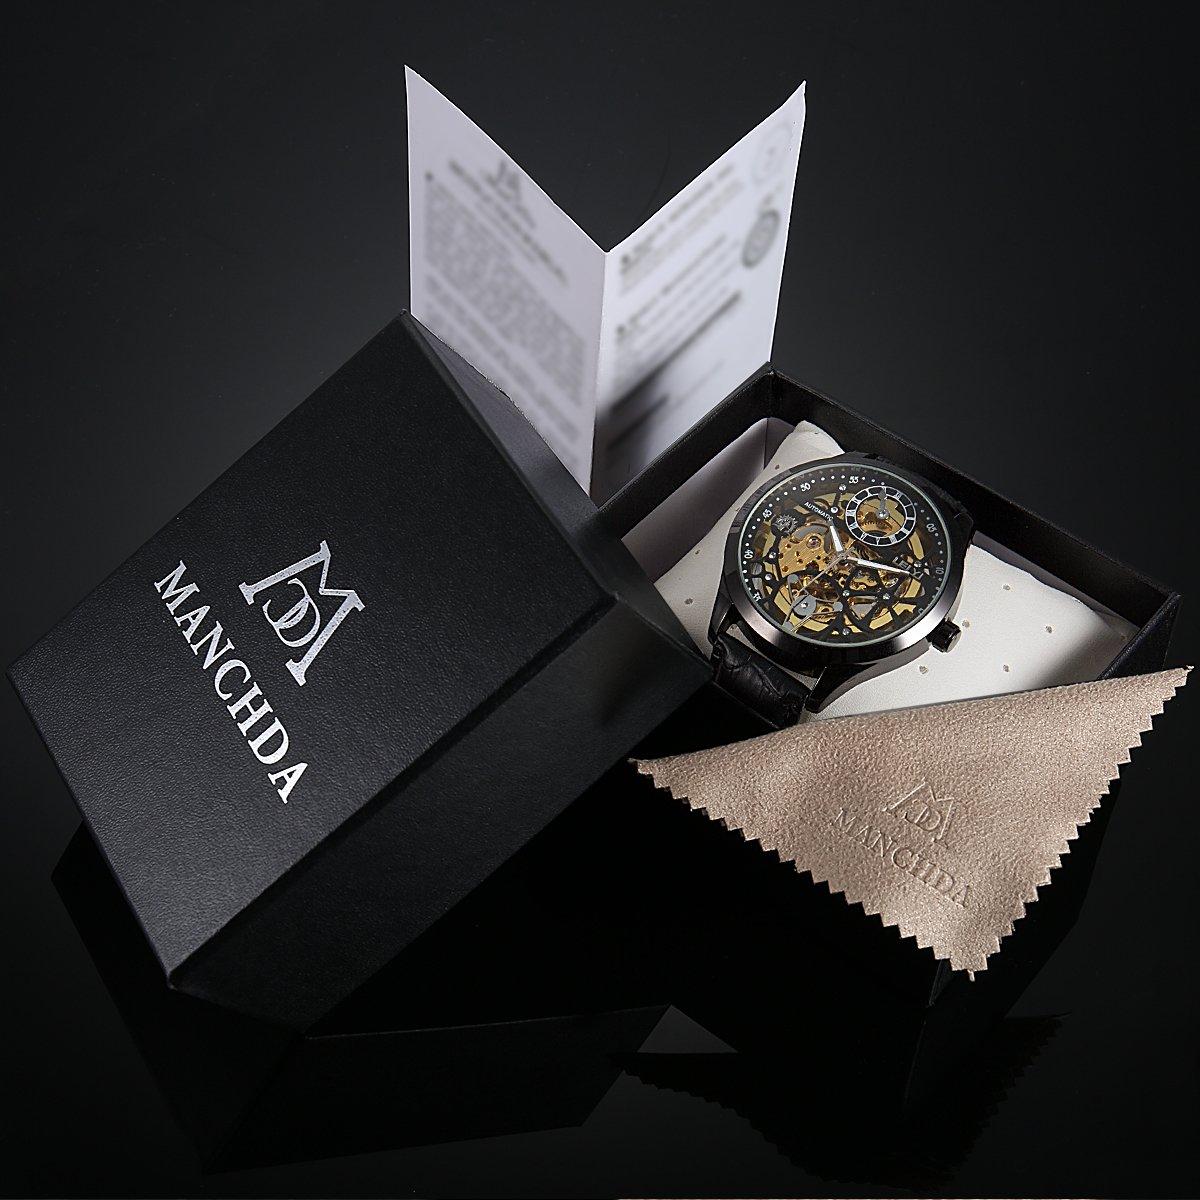 ManChDa Big Case 47MM XL Automatic Mechanical Crystal Black Leather Wrist Watch + Gift Box by ManChDa (Image #7)